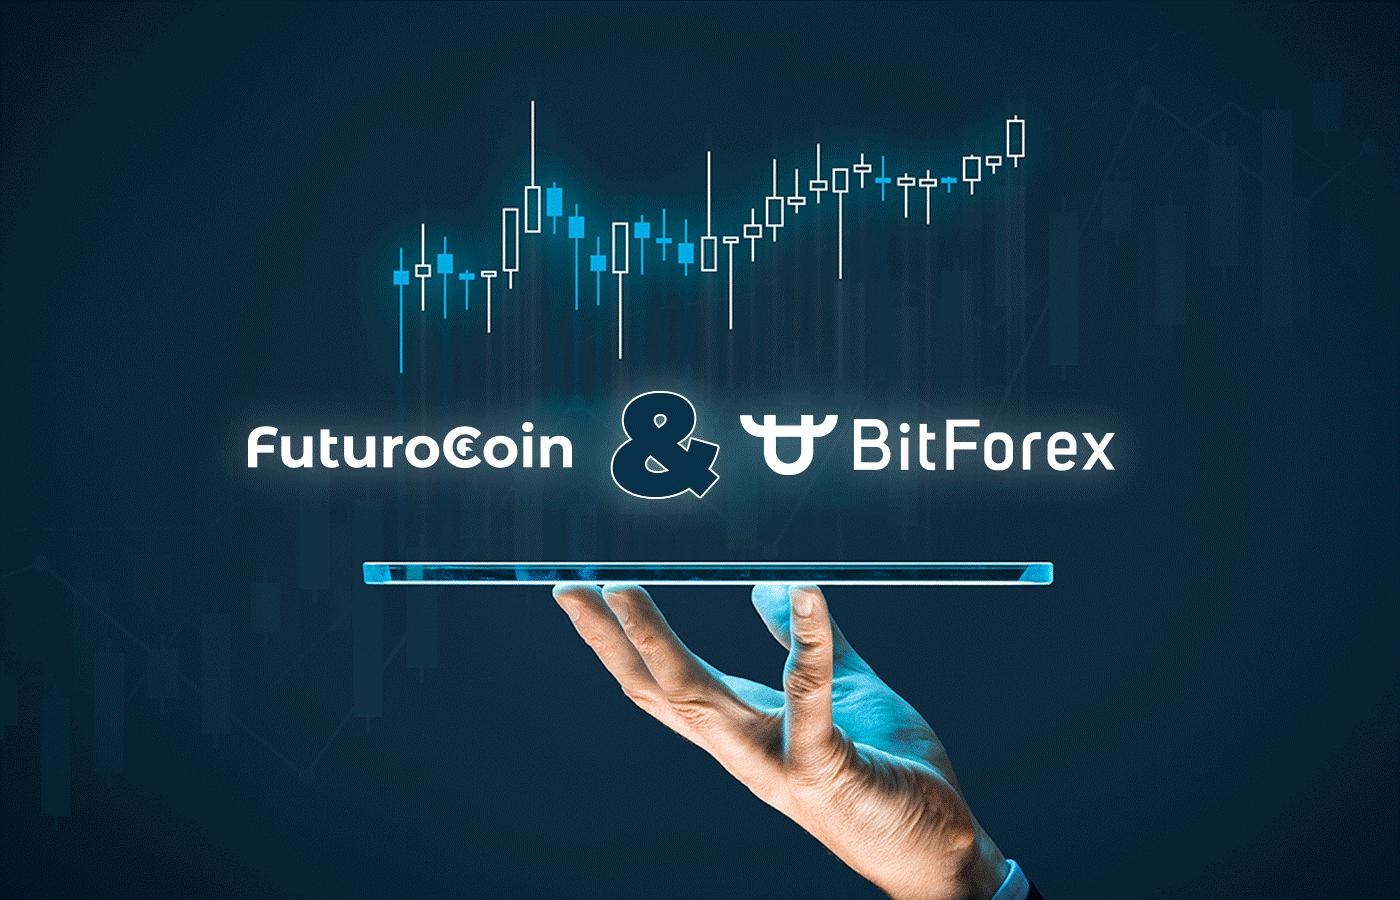 bitcoin trading platform fto bitcoin 20 év alatt